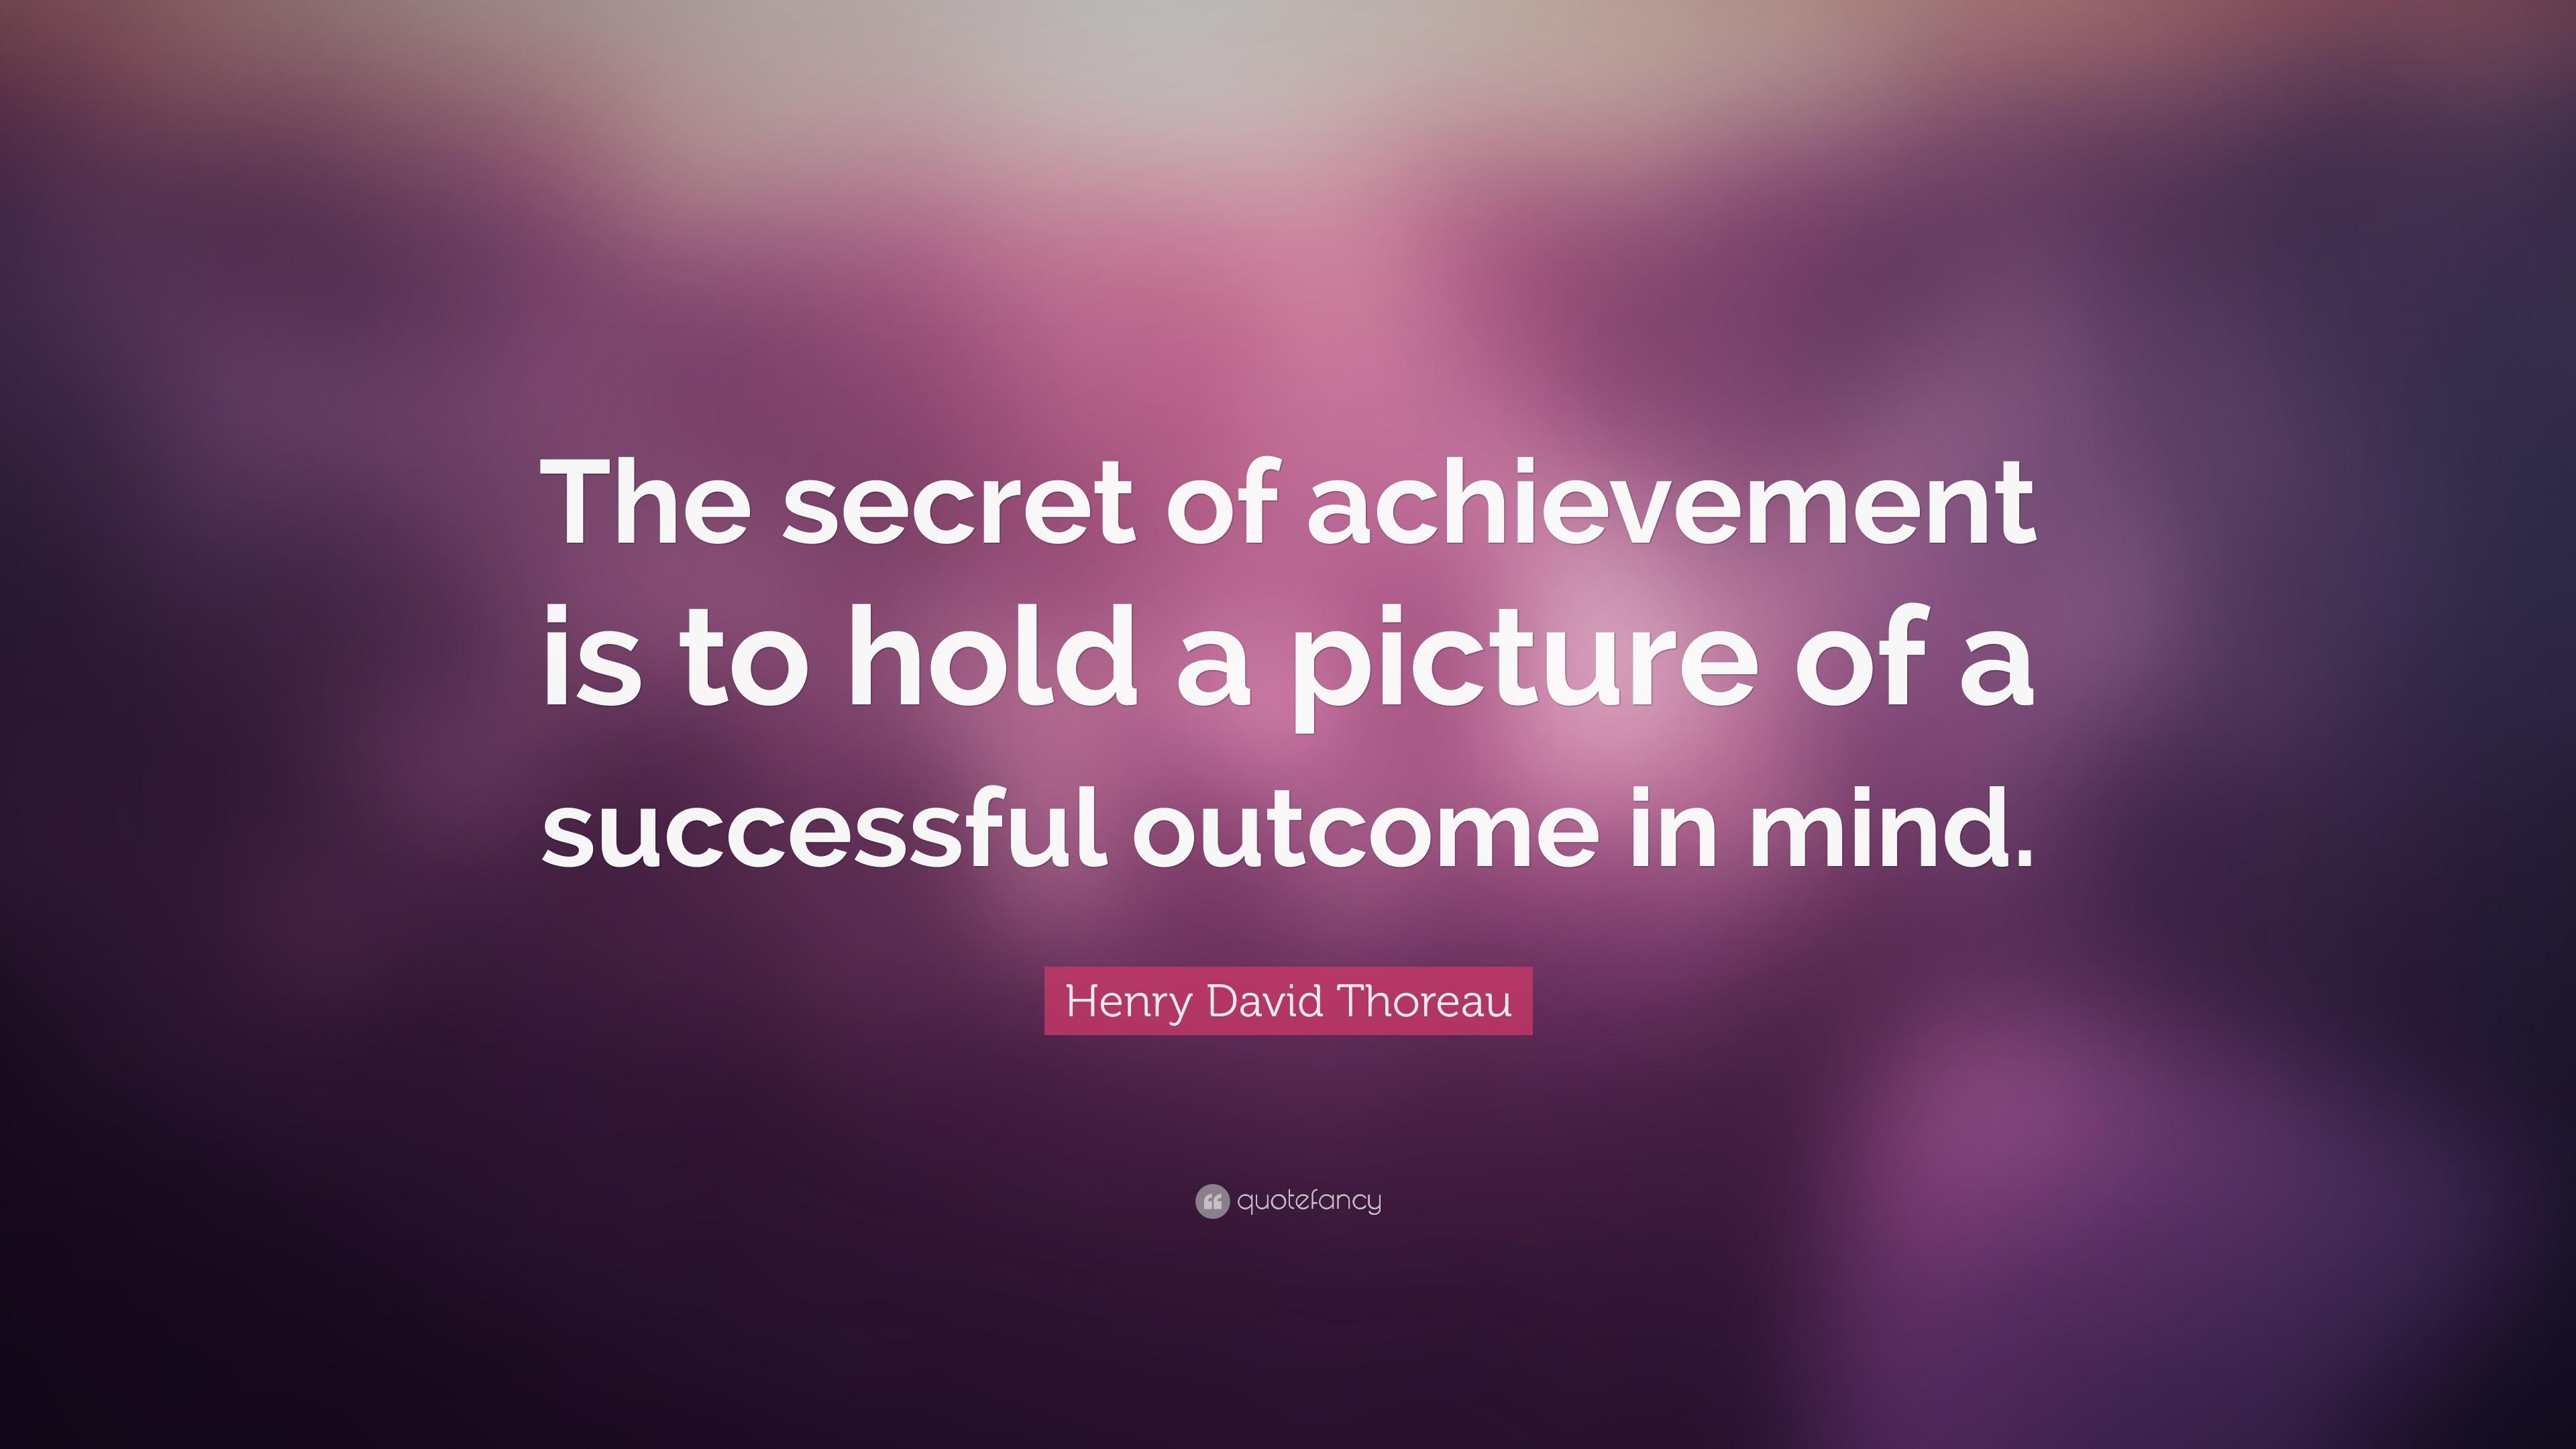 Image result for henry david thoreau quote the secret of achievement